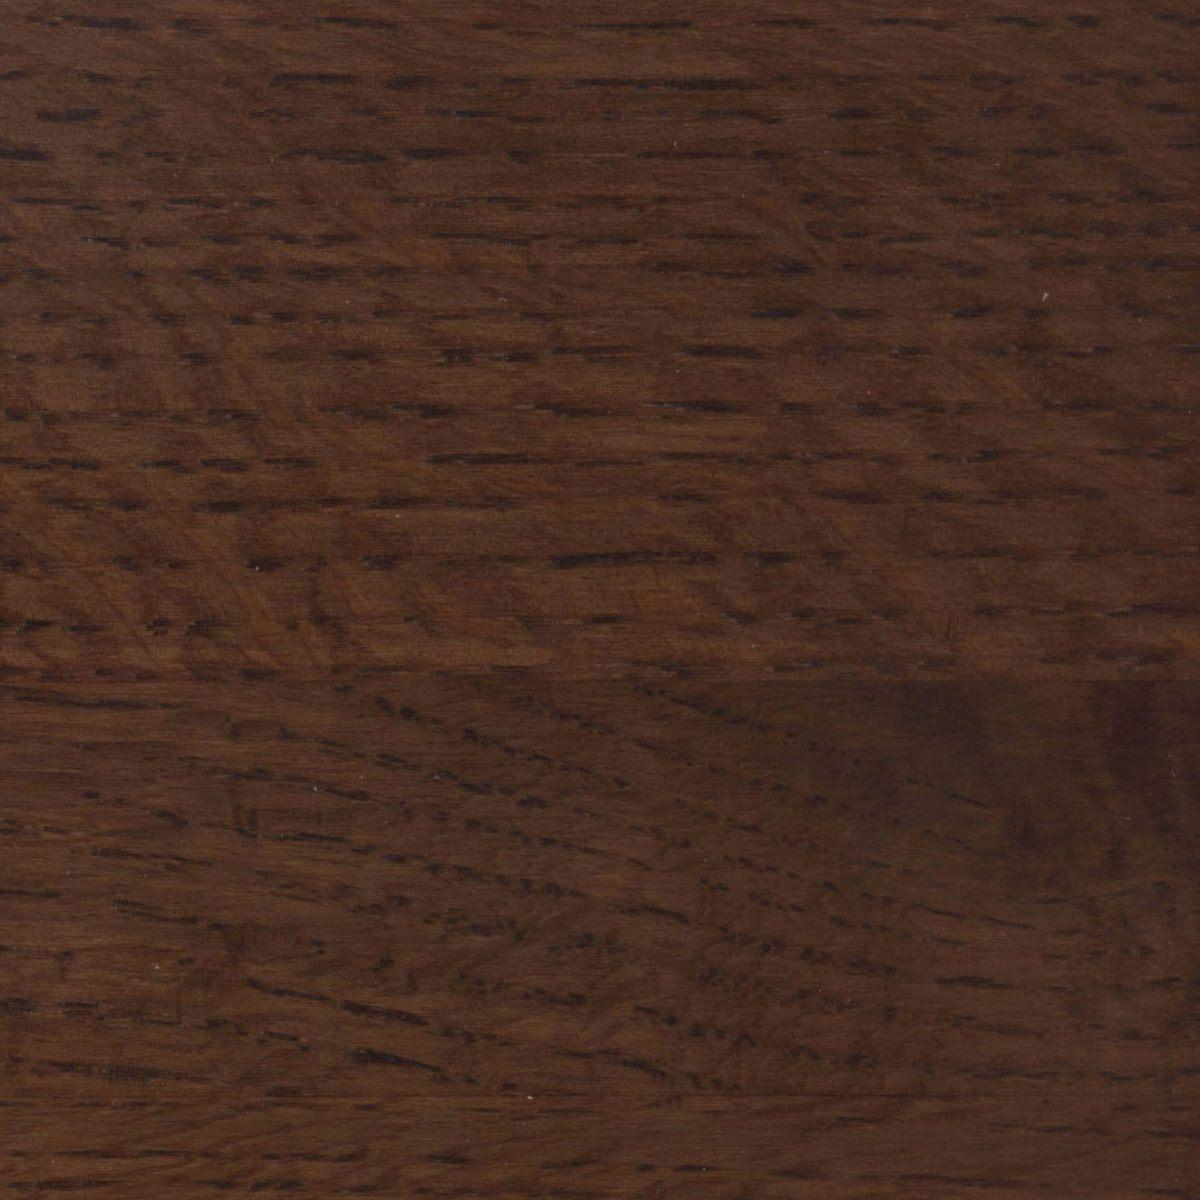 67A Quarter Sawn White Oak Wood Sample